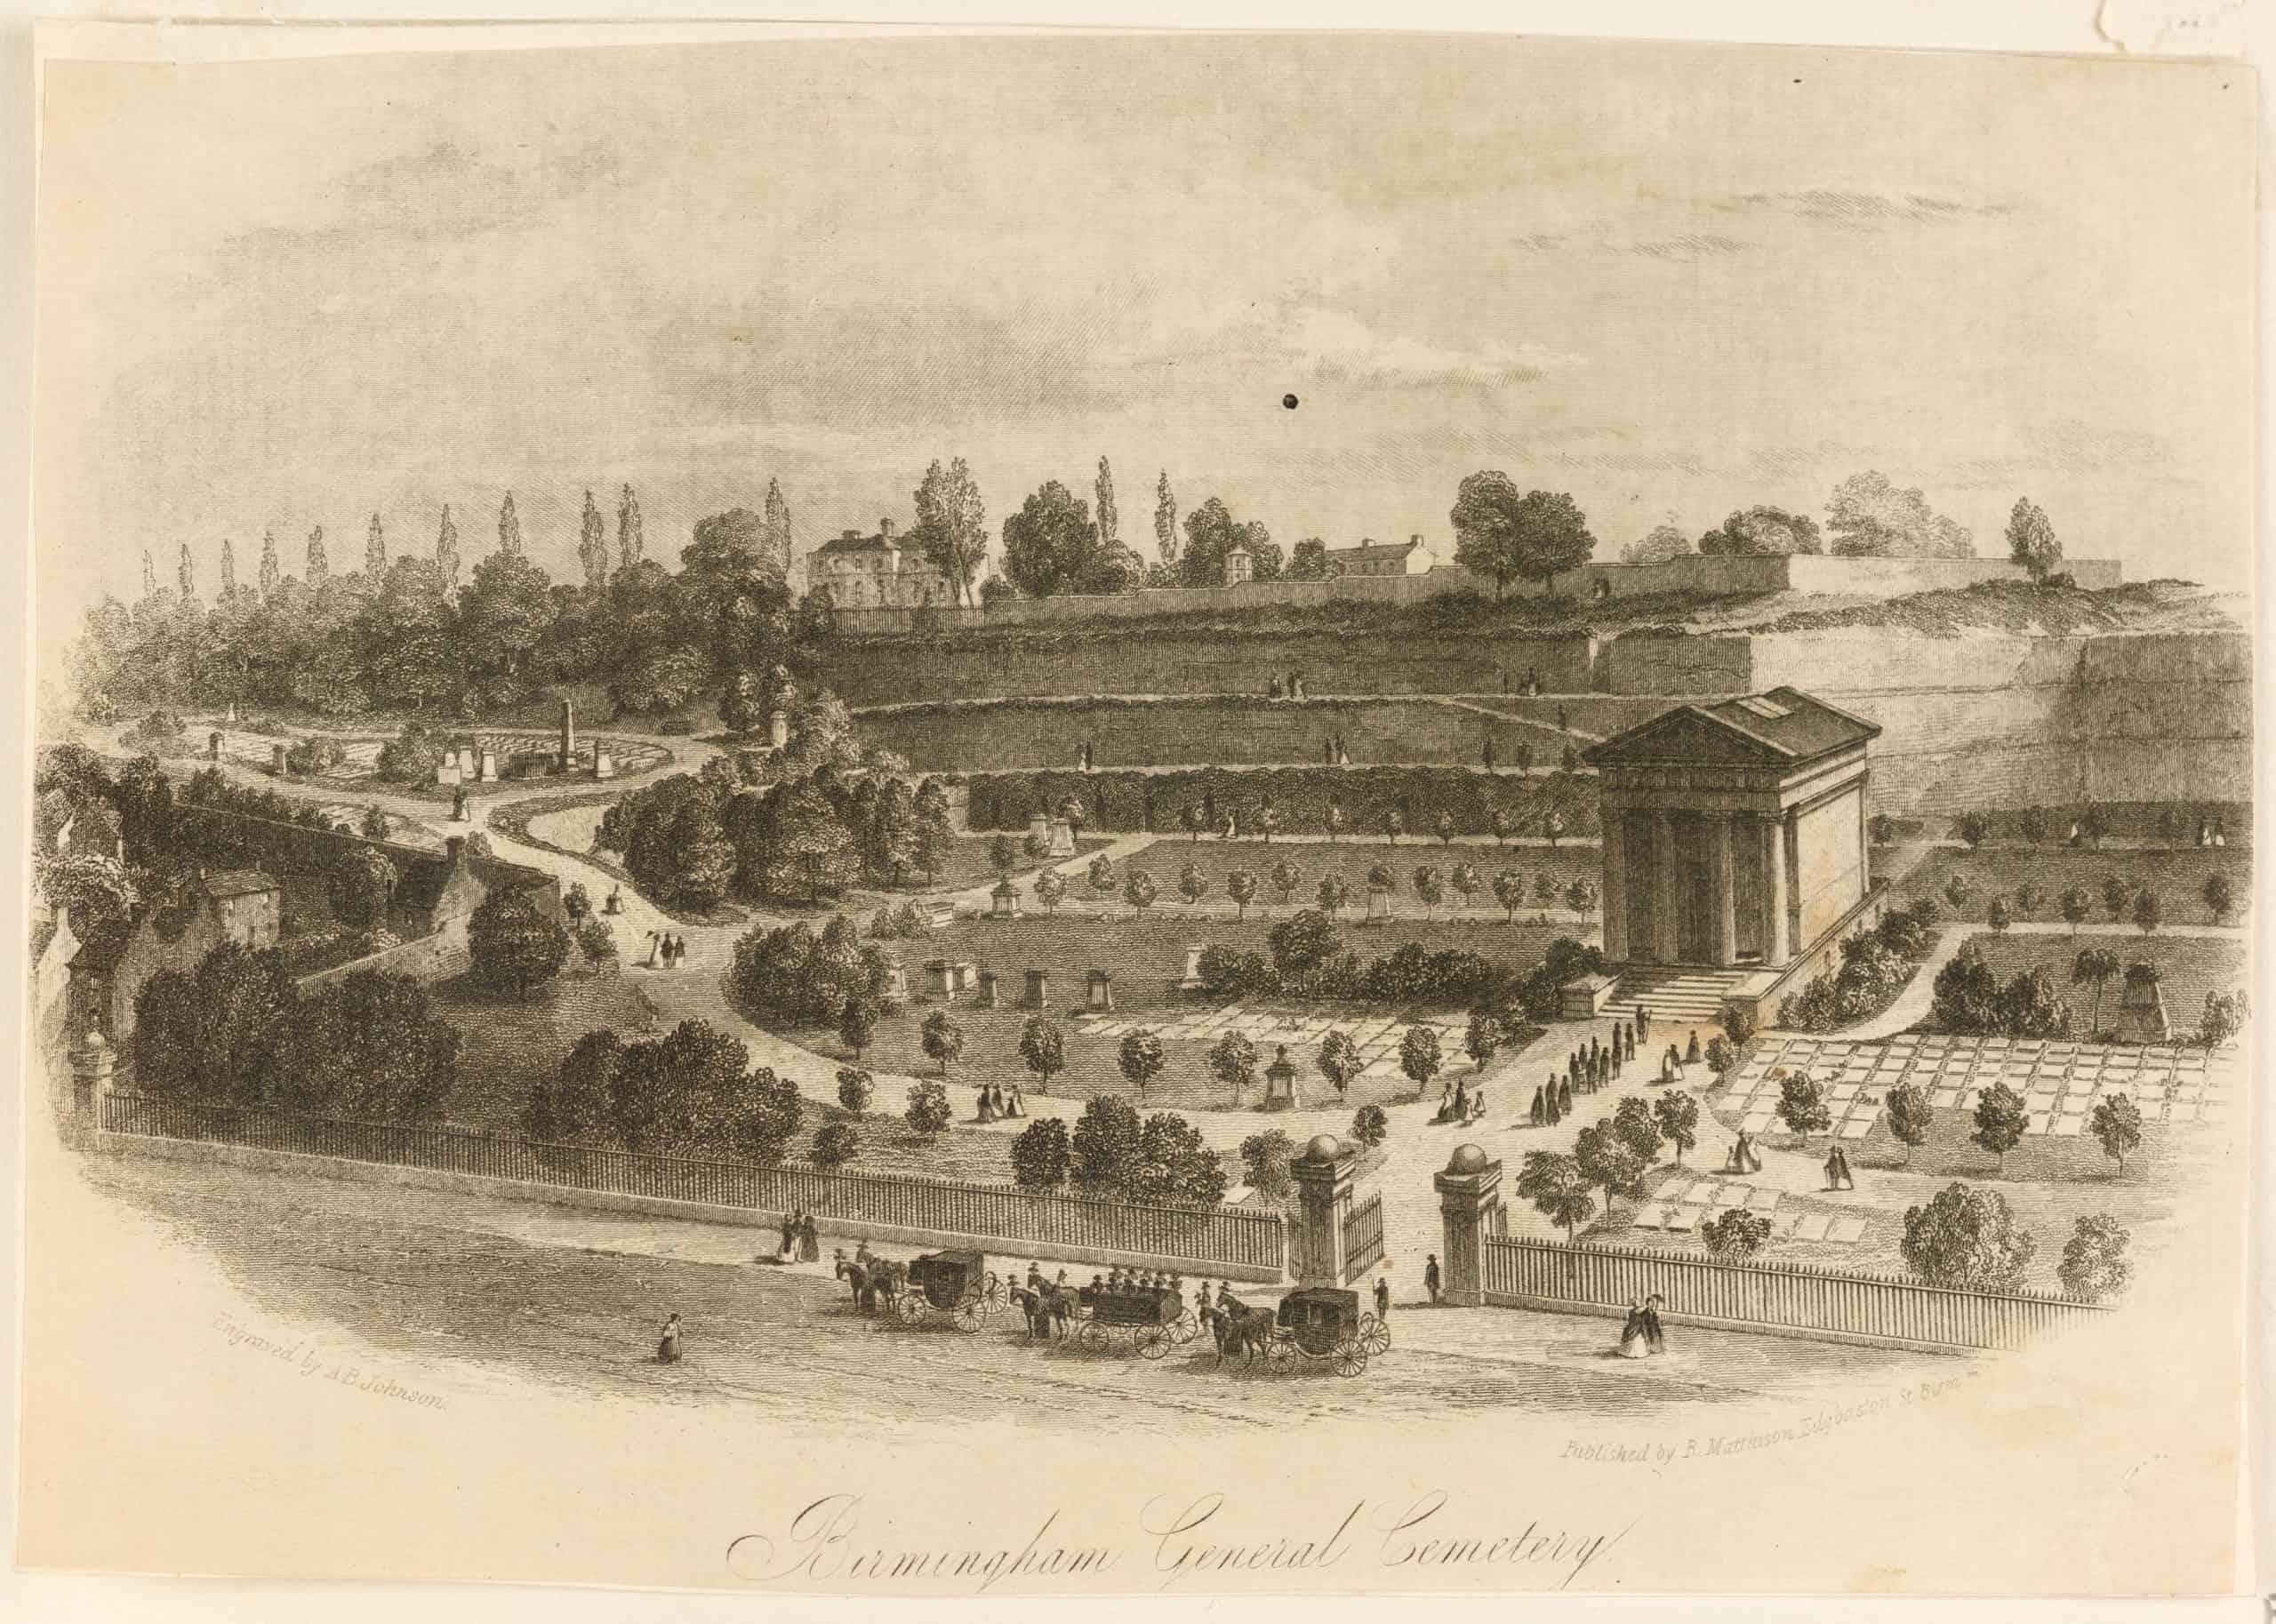 Engraving of Birmingham General Cemetery by A B Johnson (Birmingham Museums Trust)